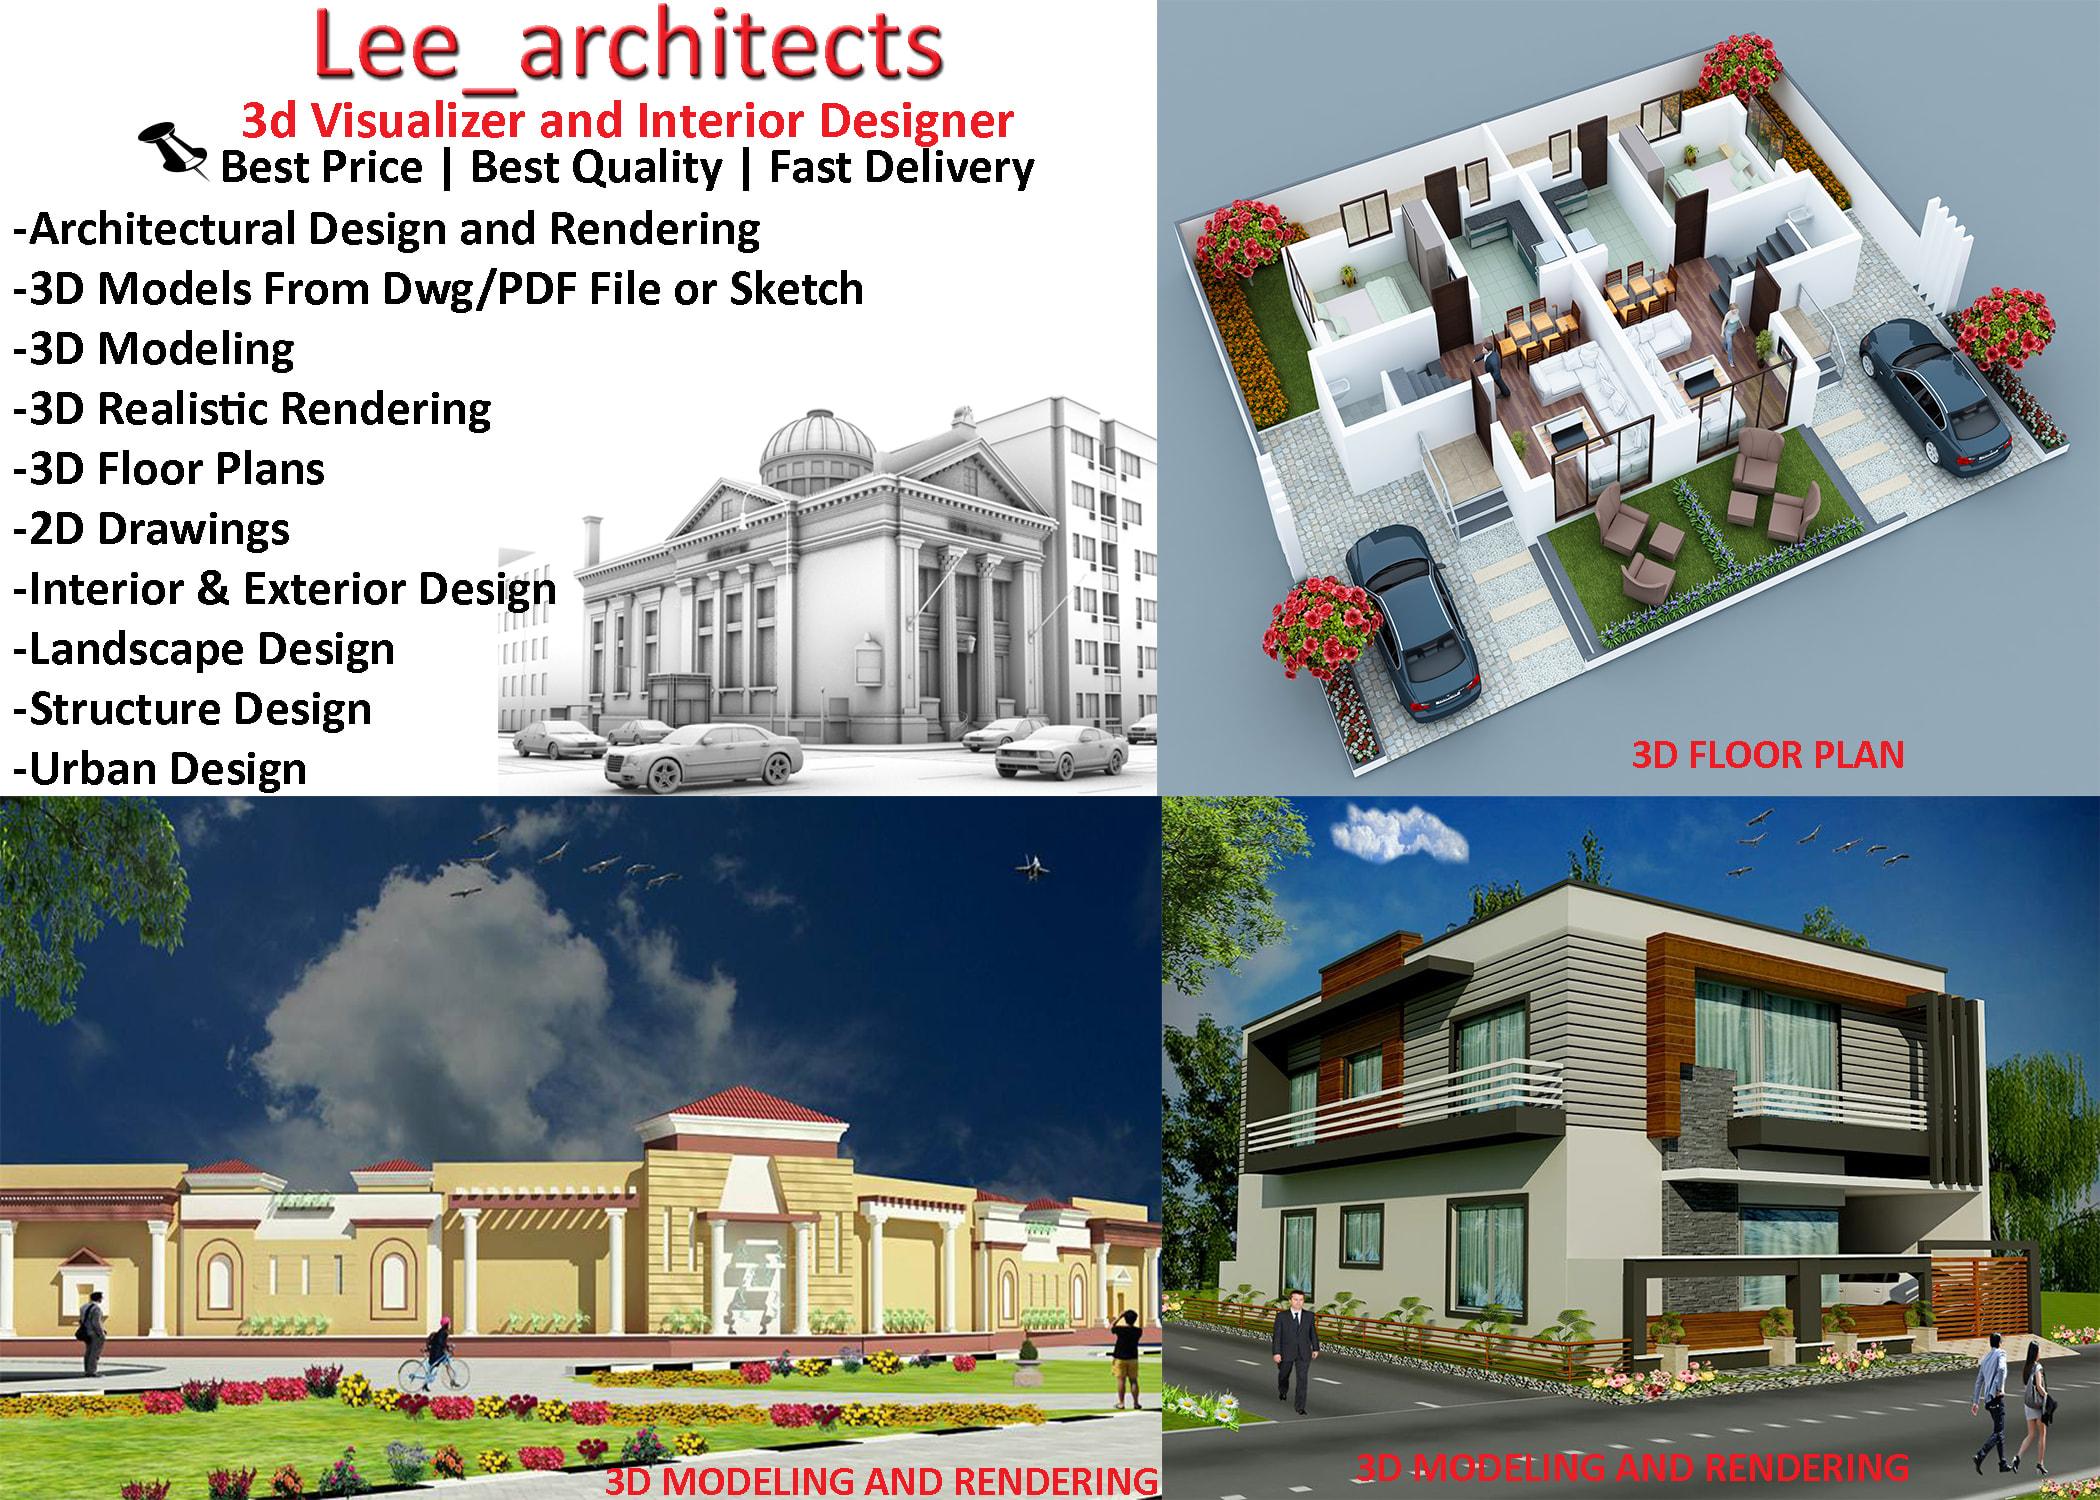 Do Revit 3d Modeling 3d Floor Plan Interior Design Rendering By Lee Architects